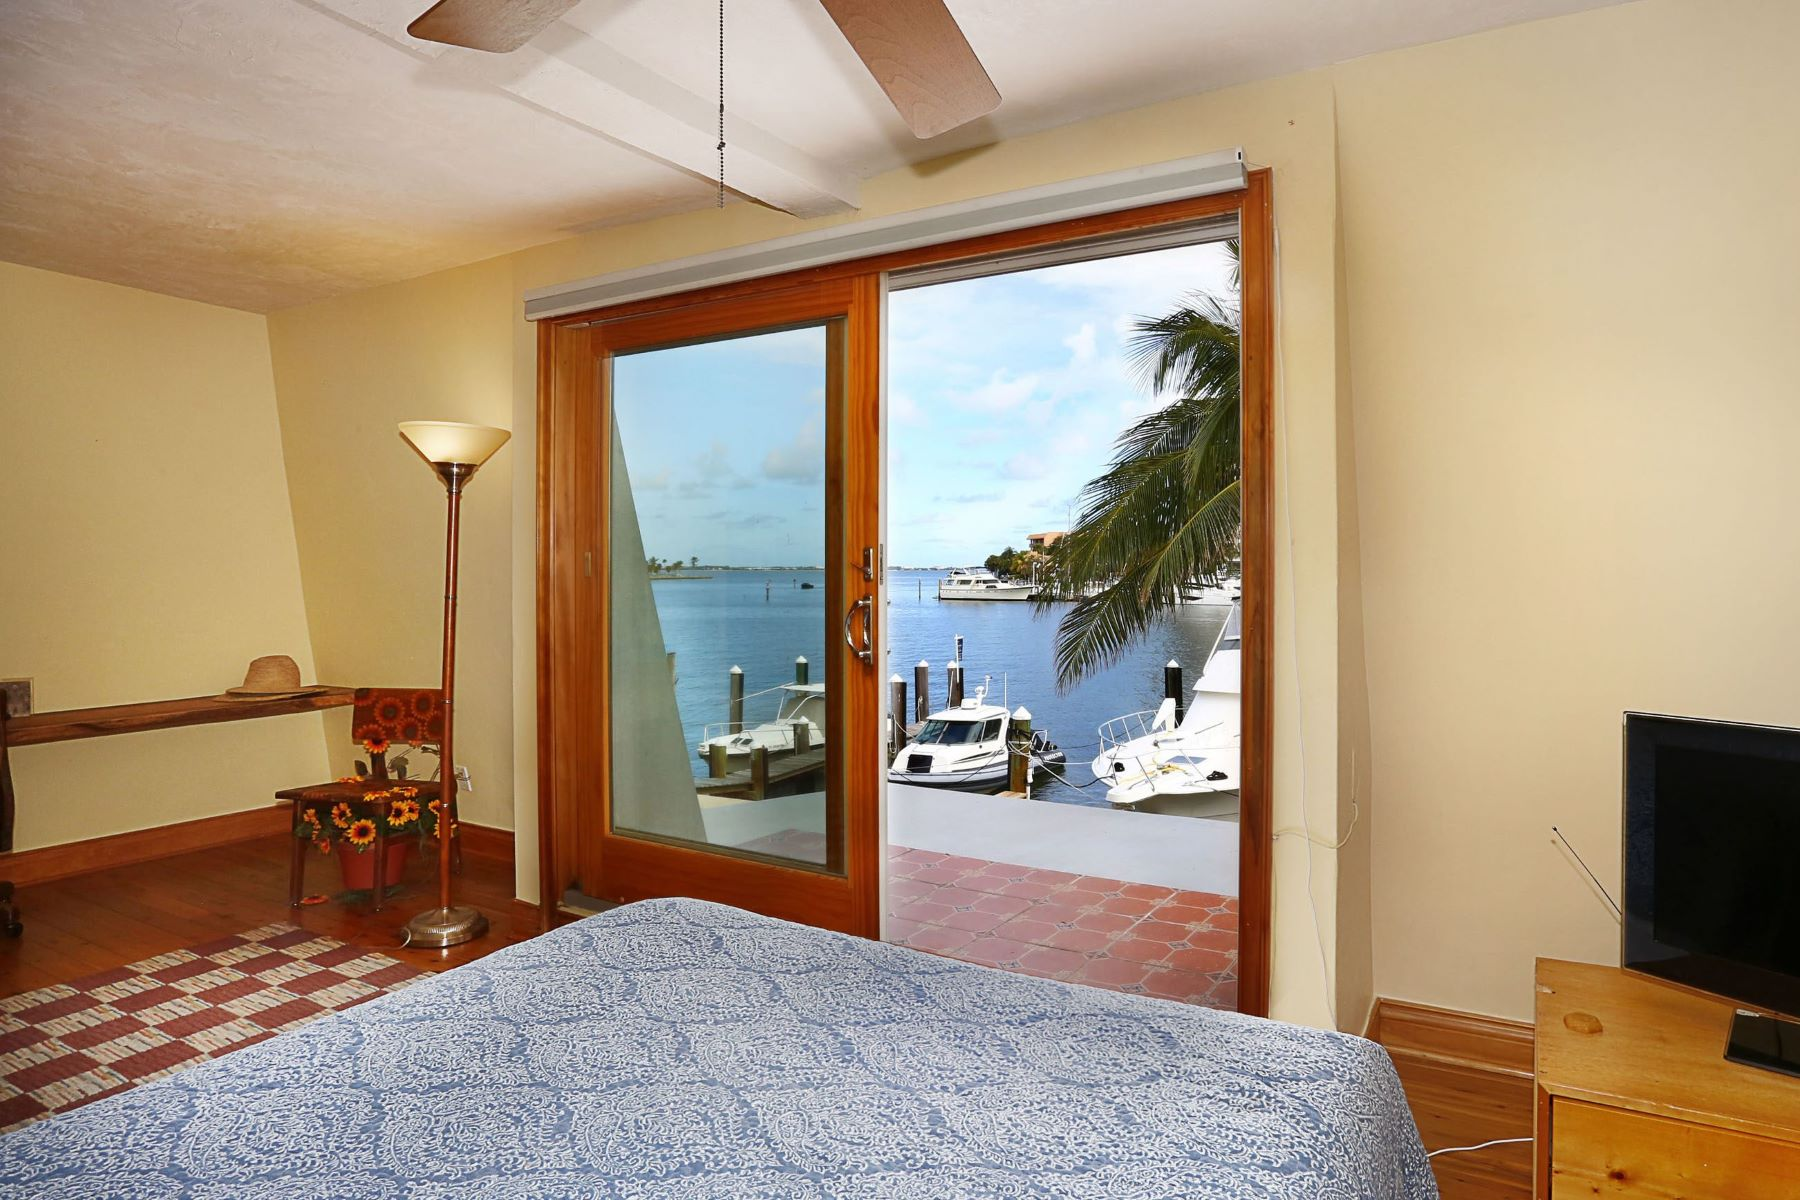 واحد منزل الأسرة للـ Sale في 1788 S Bayshore Ln 1788 S Bayshore Ln Coconut Grove, Florida 33133 United States